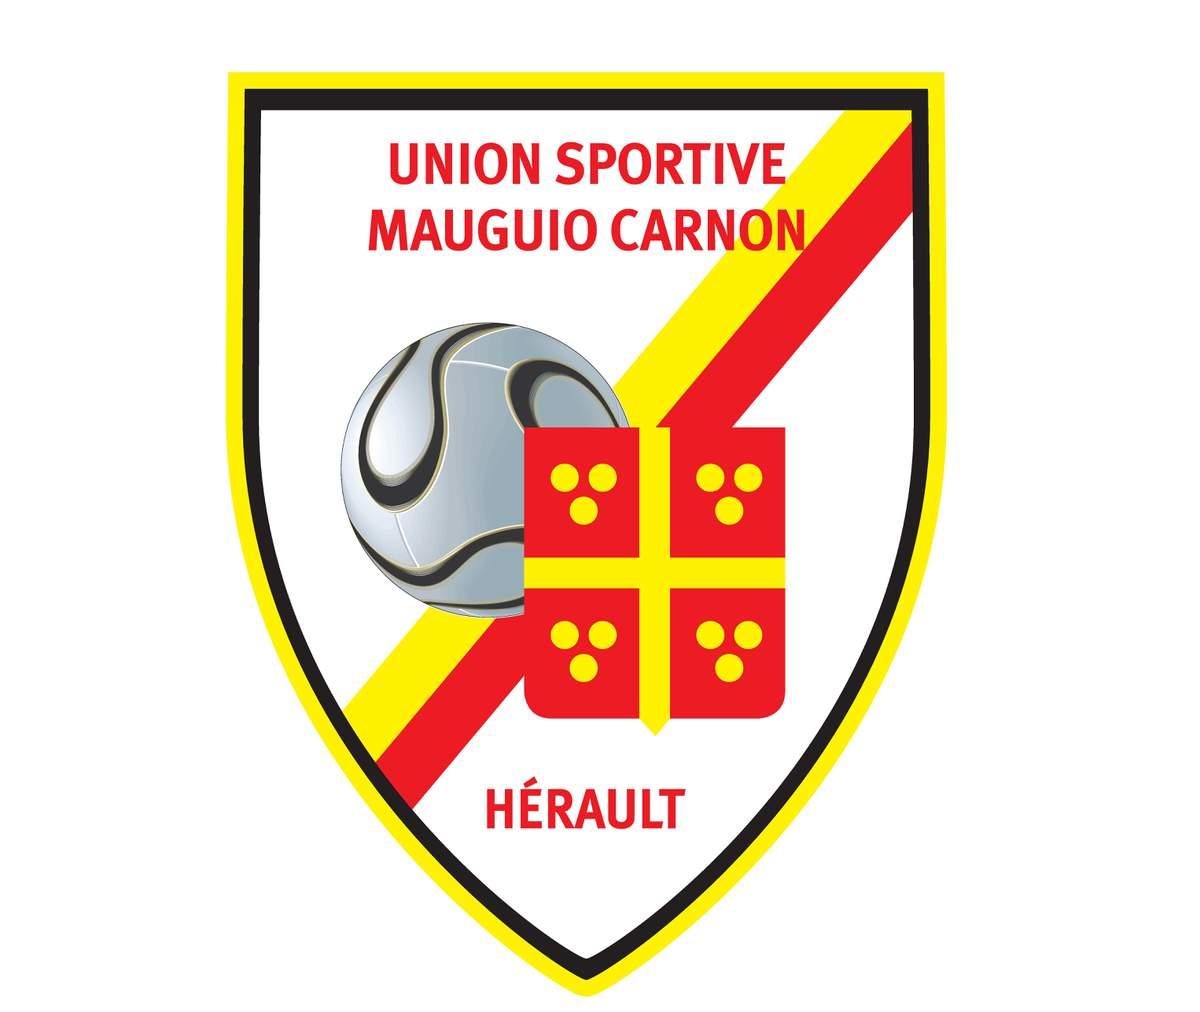 MAUGUIO CARNON US